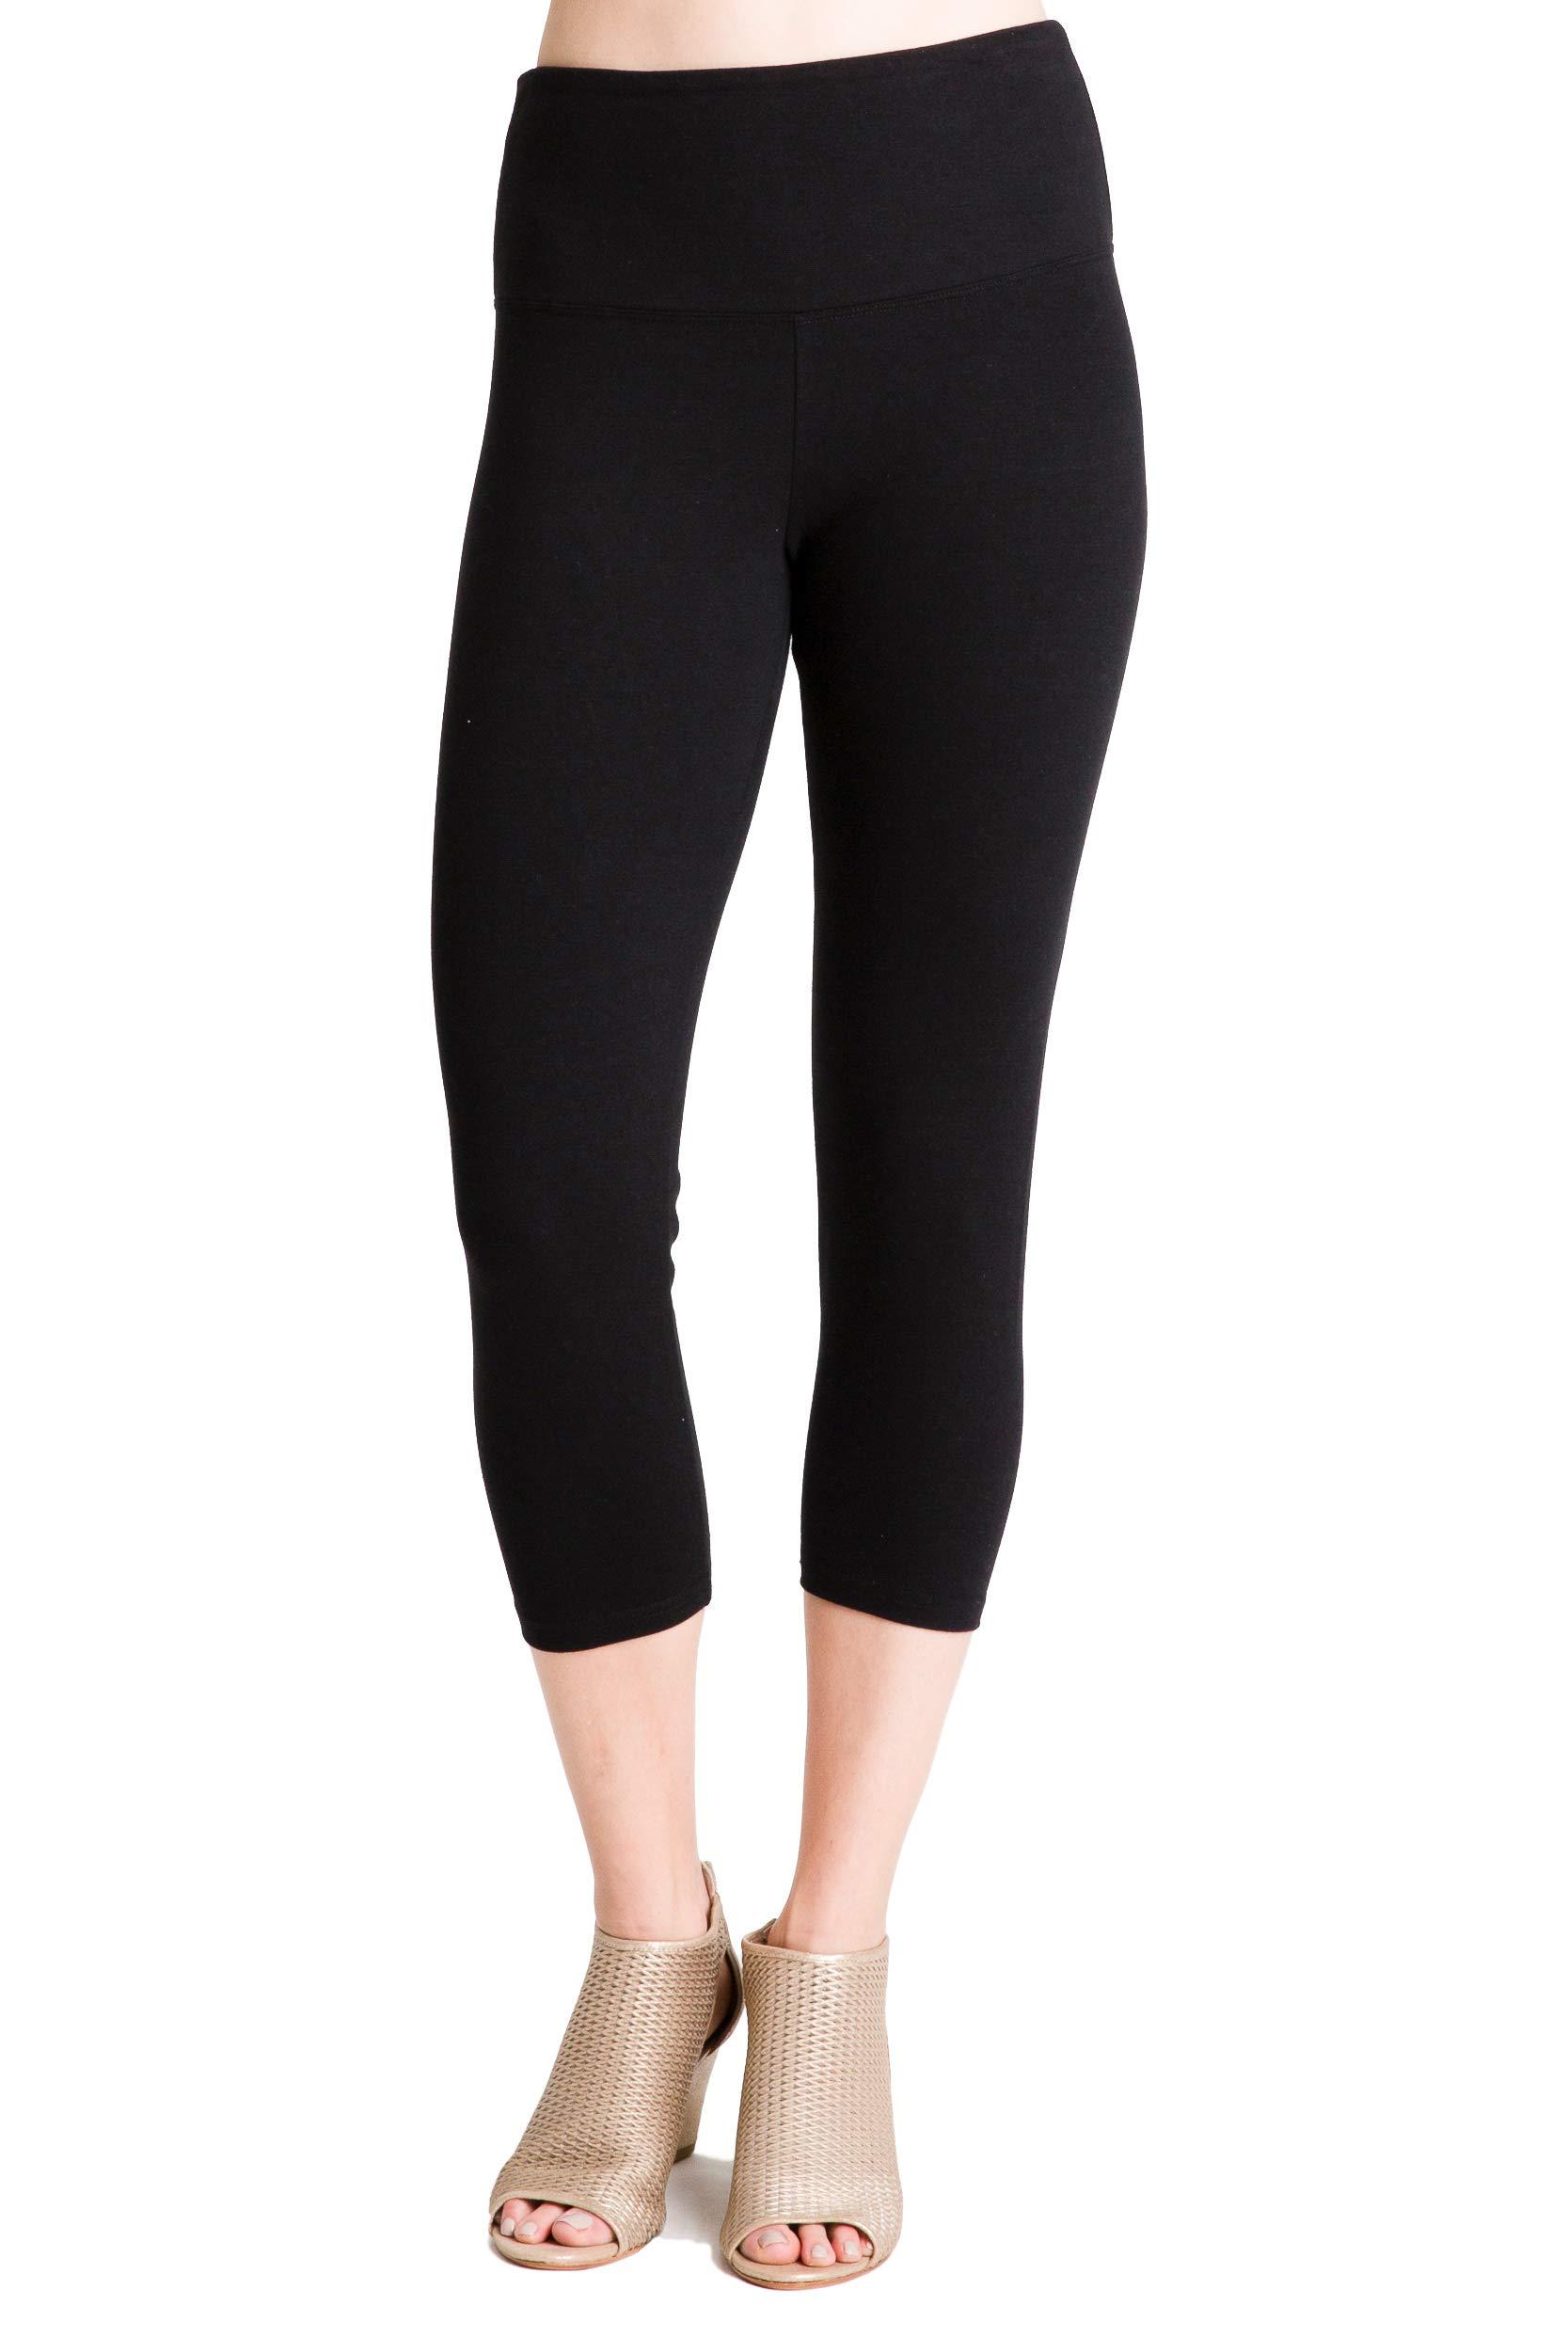 Intro Tummy Control High Waist Capri Length Legging BLK-PXL